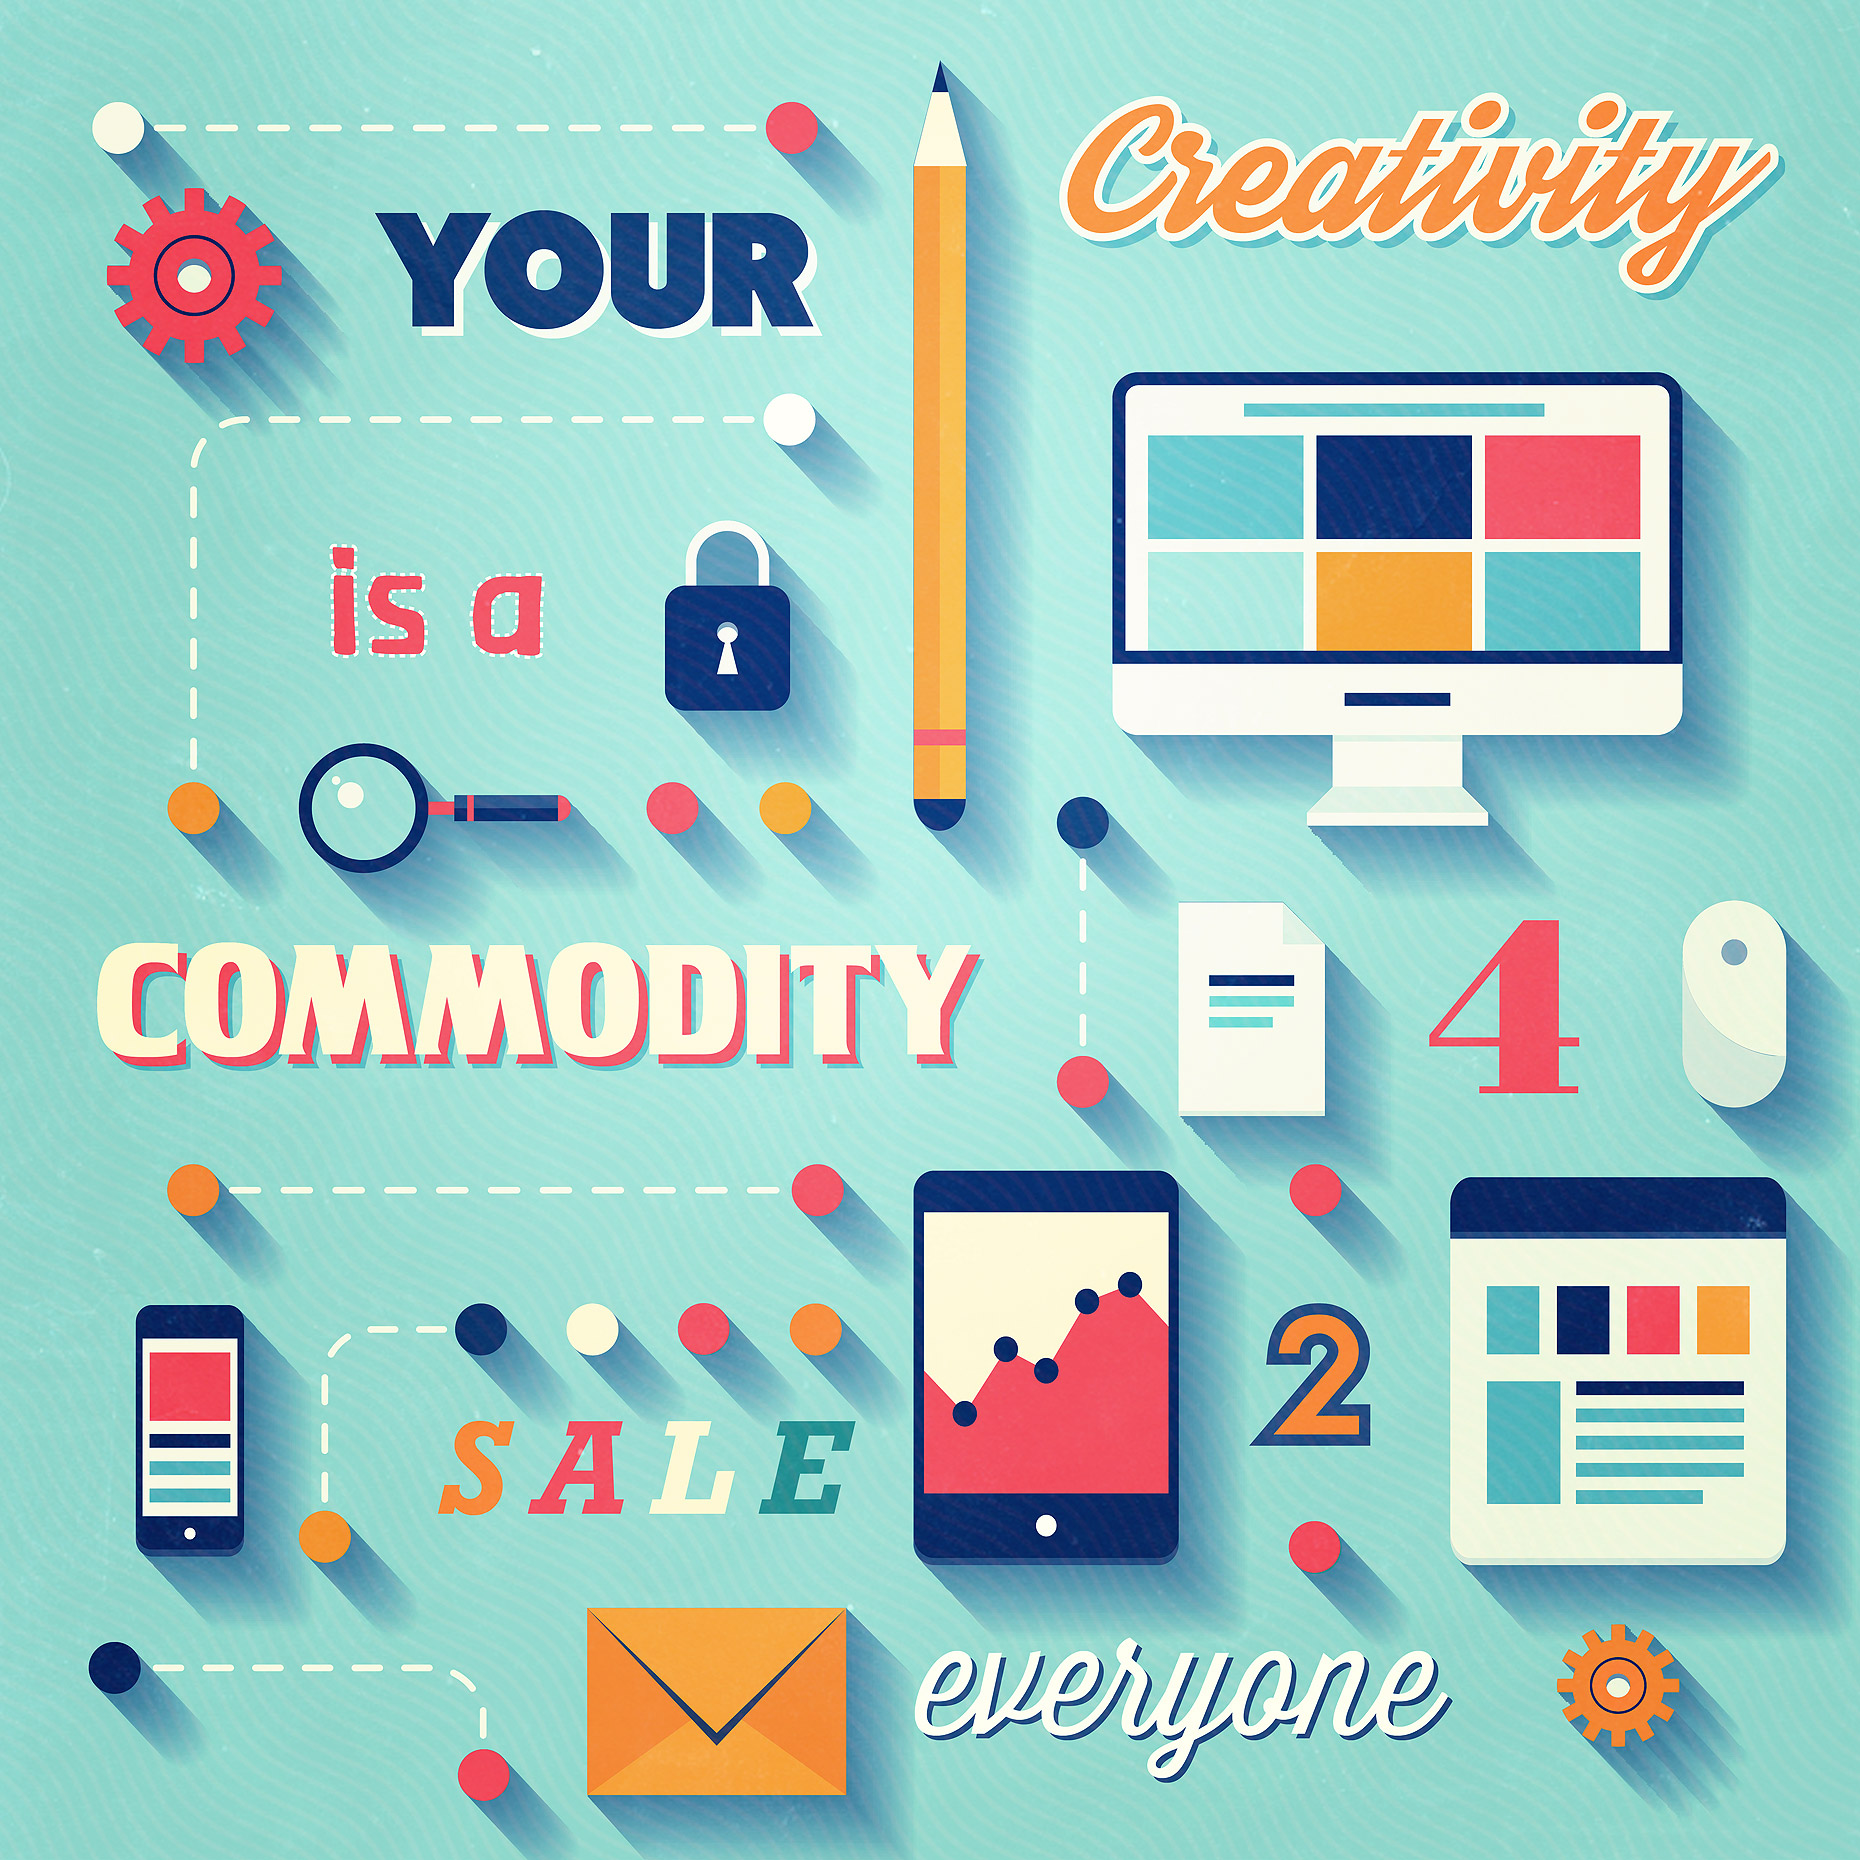 creativity-is-commodity